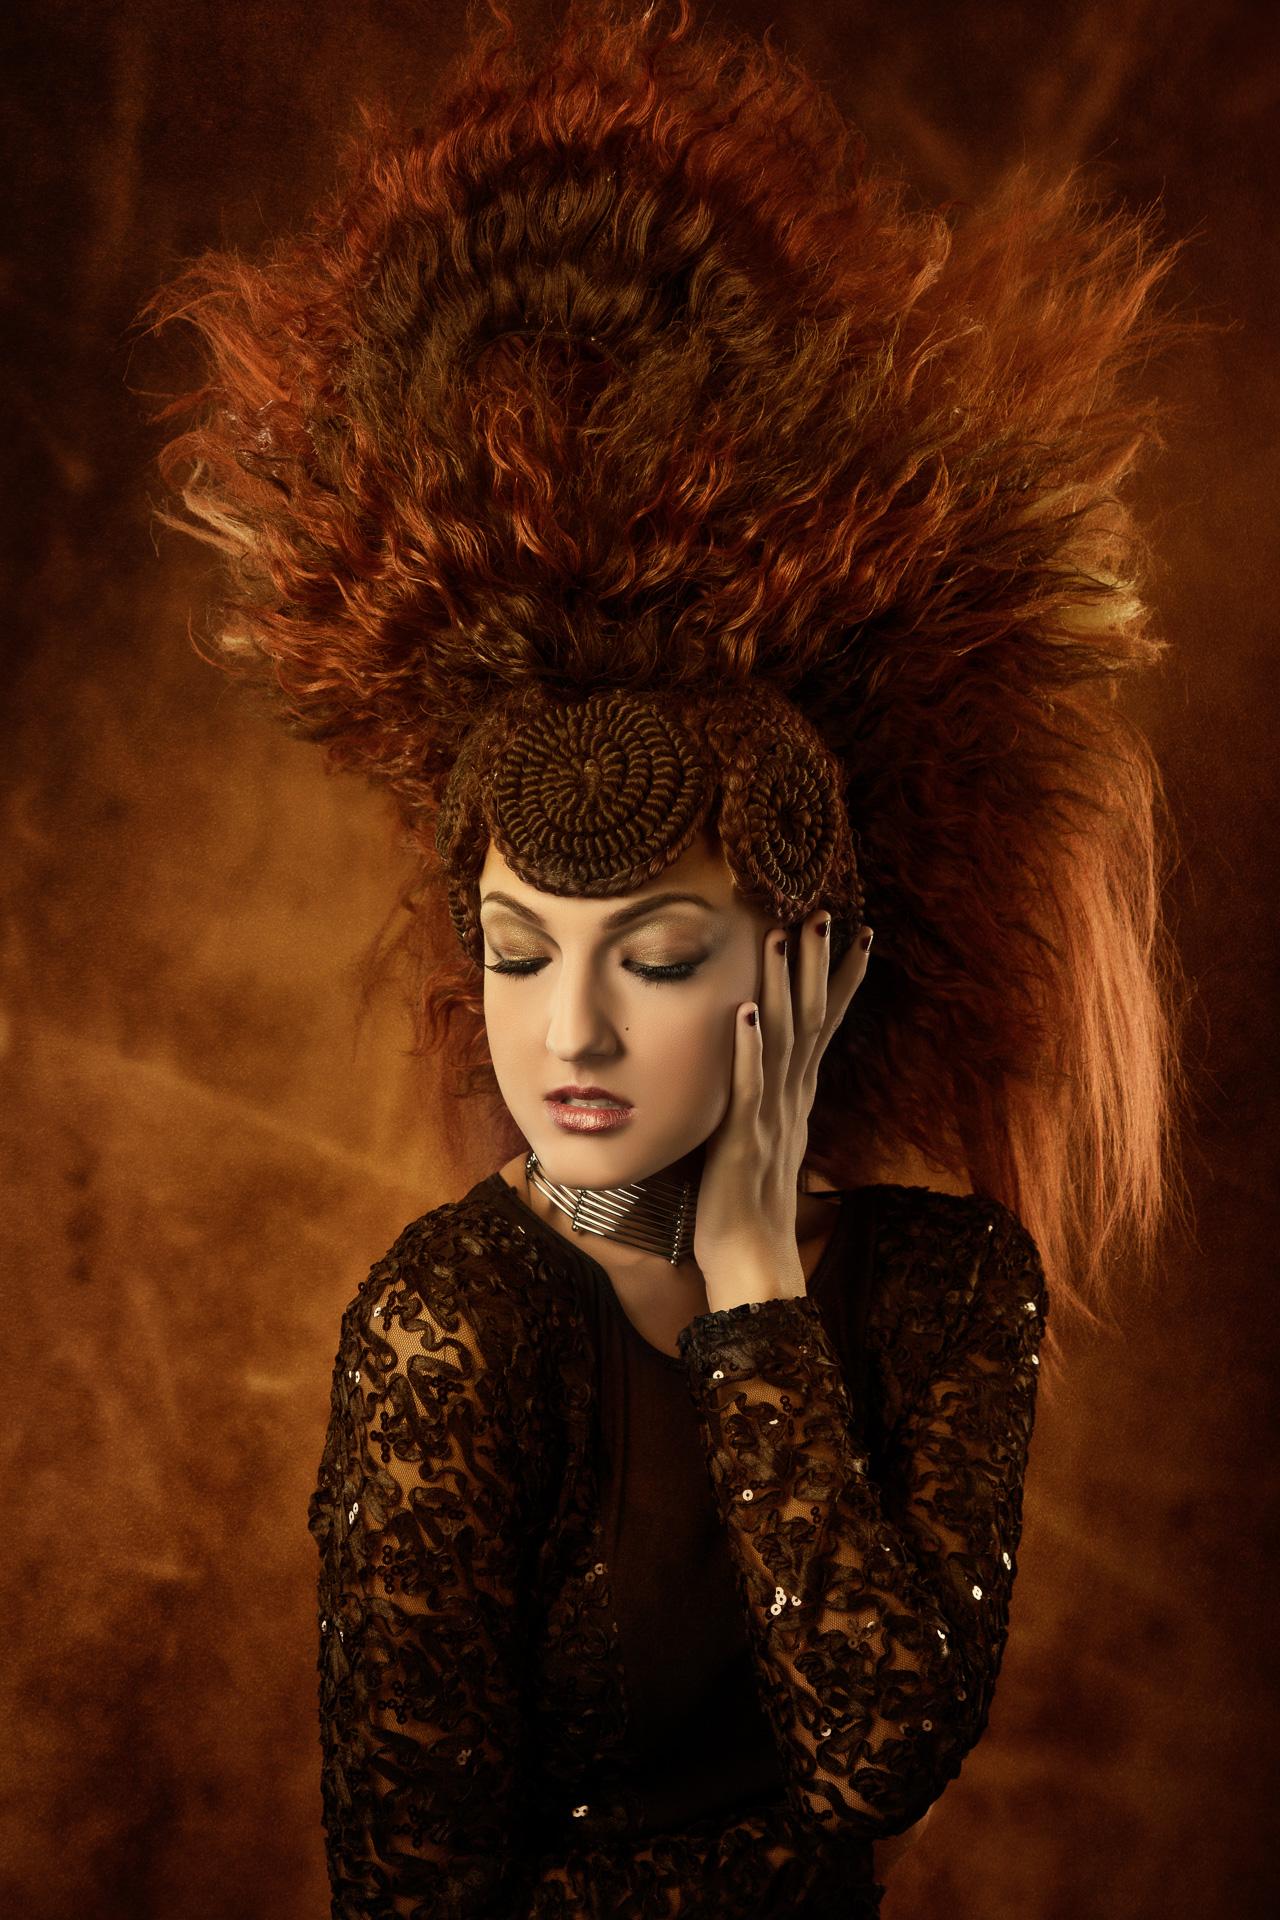 Jack Zucker Photography - hair Karen Baxter-Feliciano - makeup Christine Juricsisn - hair assist Dominique Todaro - set styling Sandra Lester